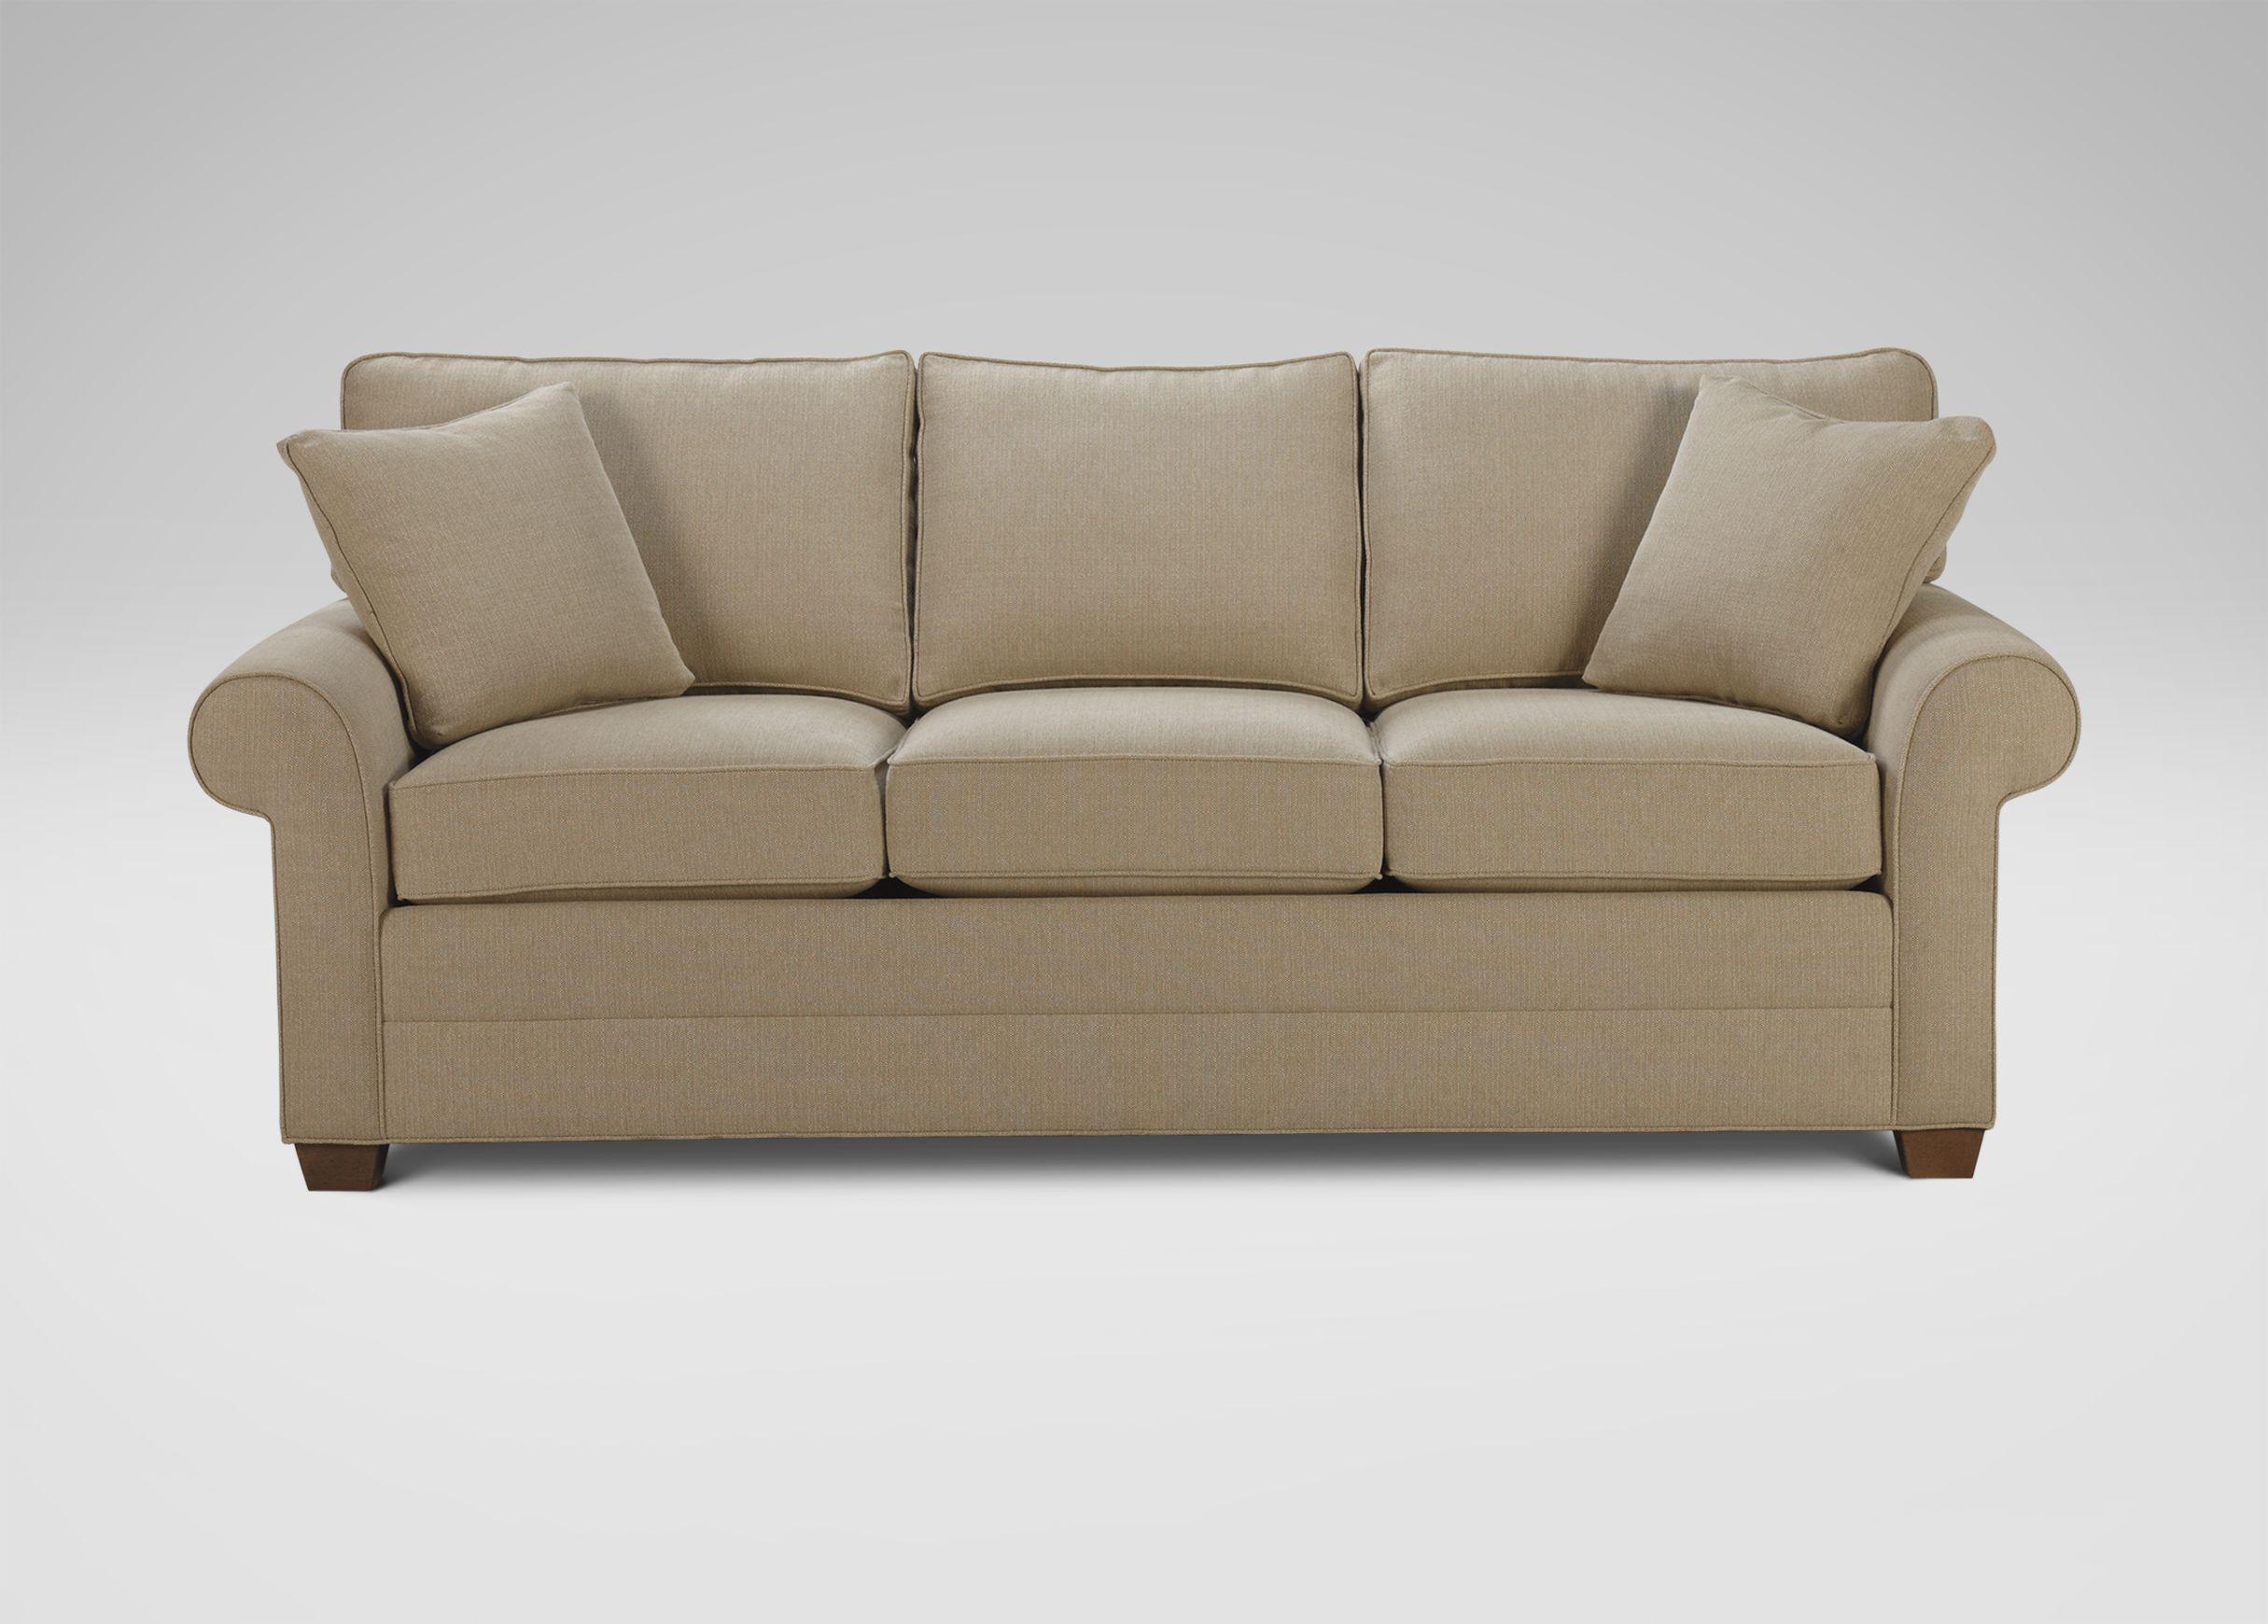 rolled arm sleeper sofa slipcover year of clean water rh yearofcleanwater org